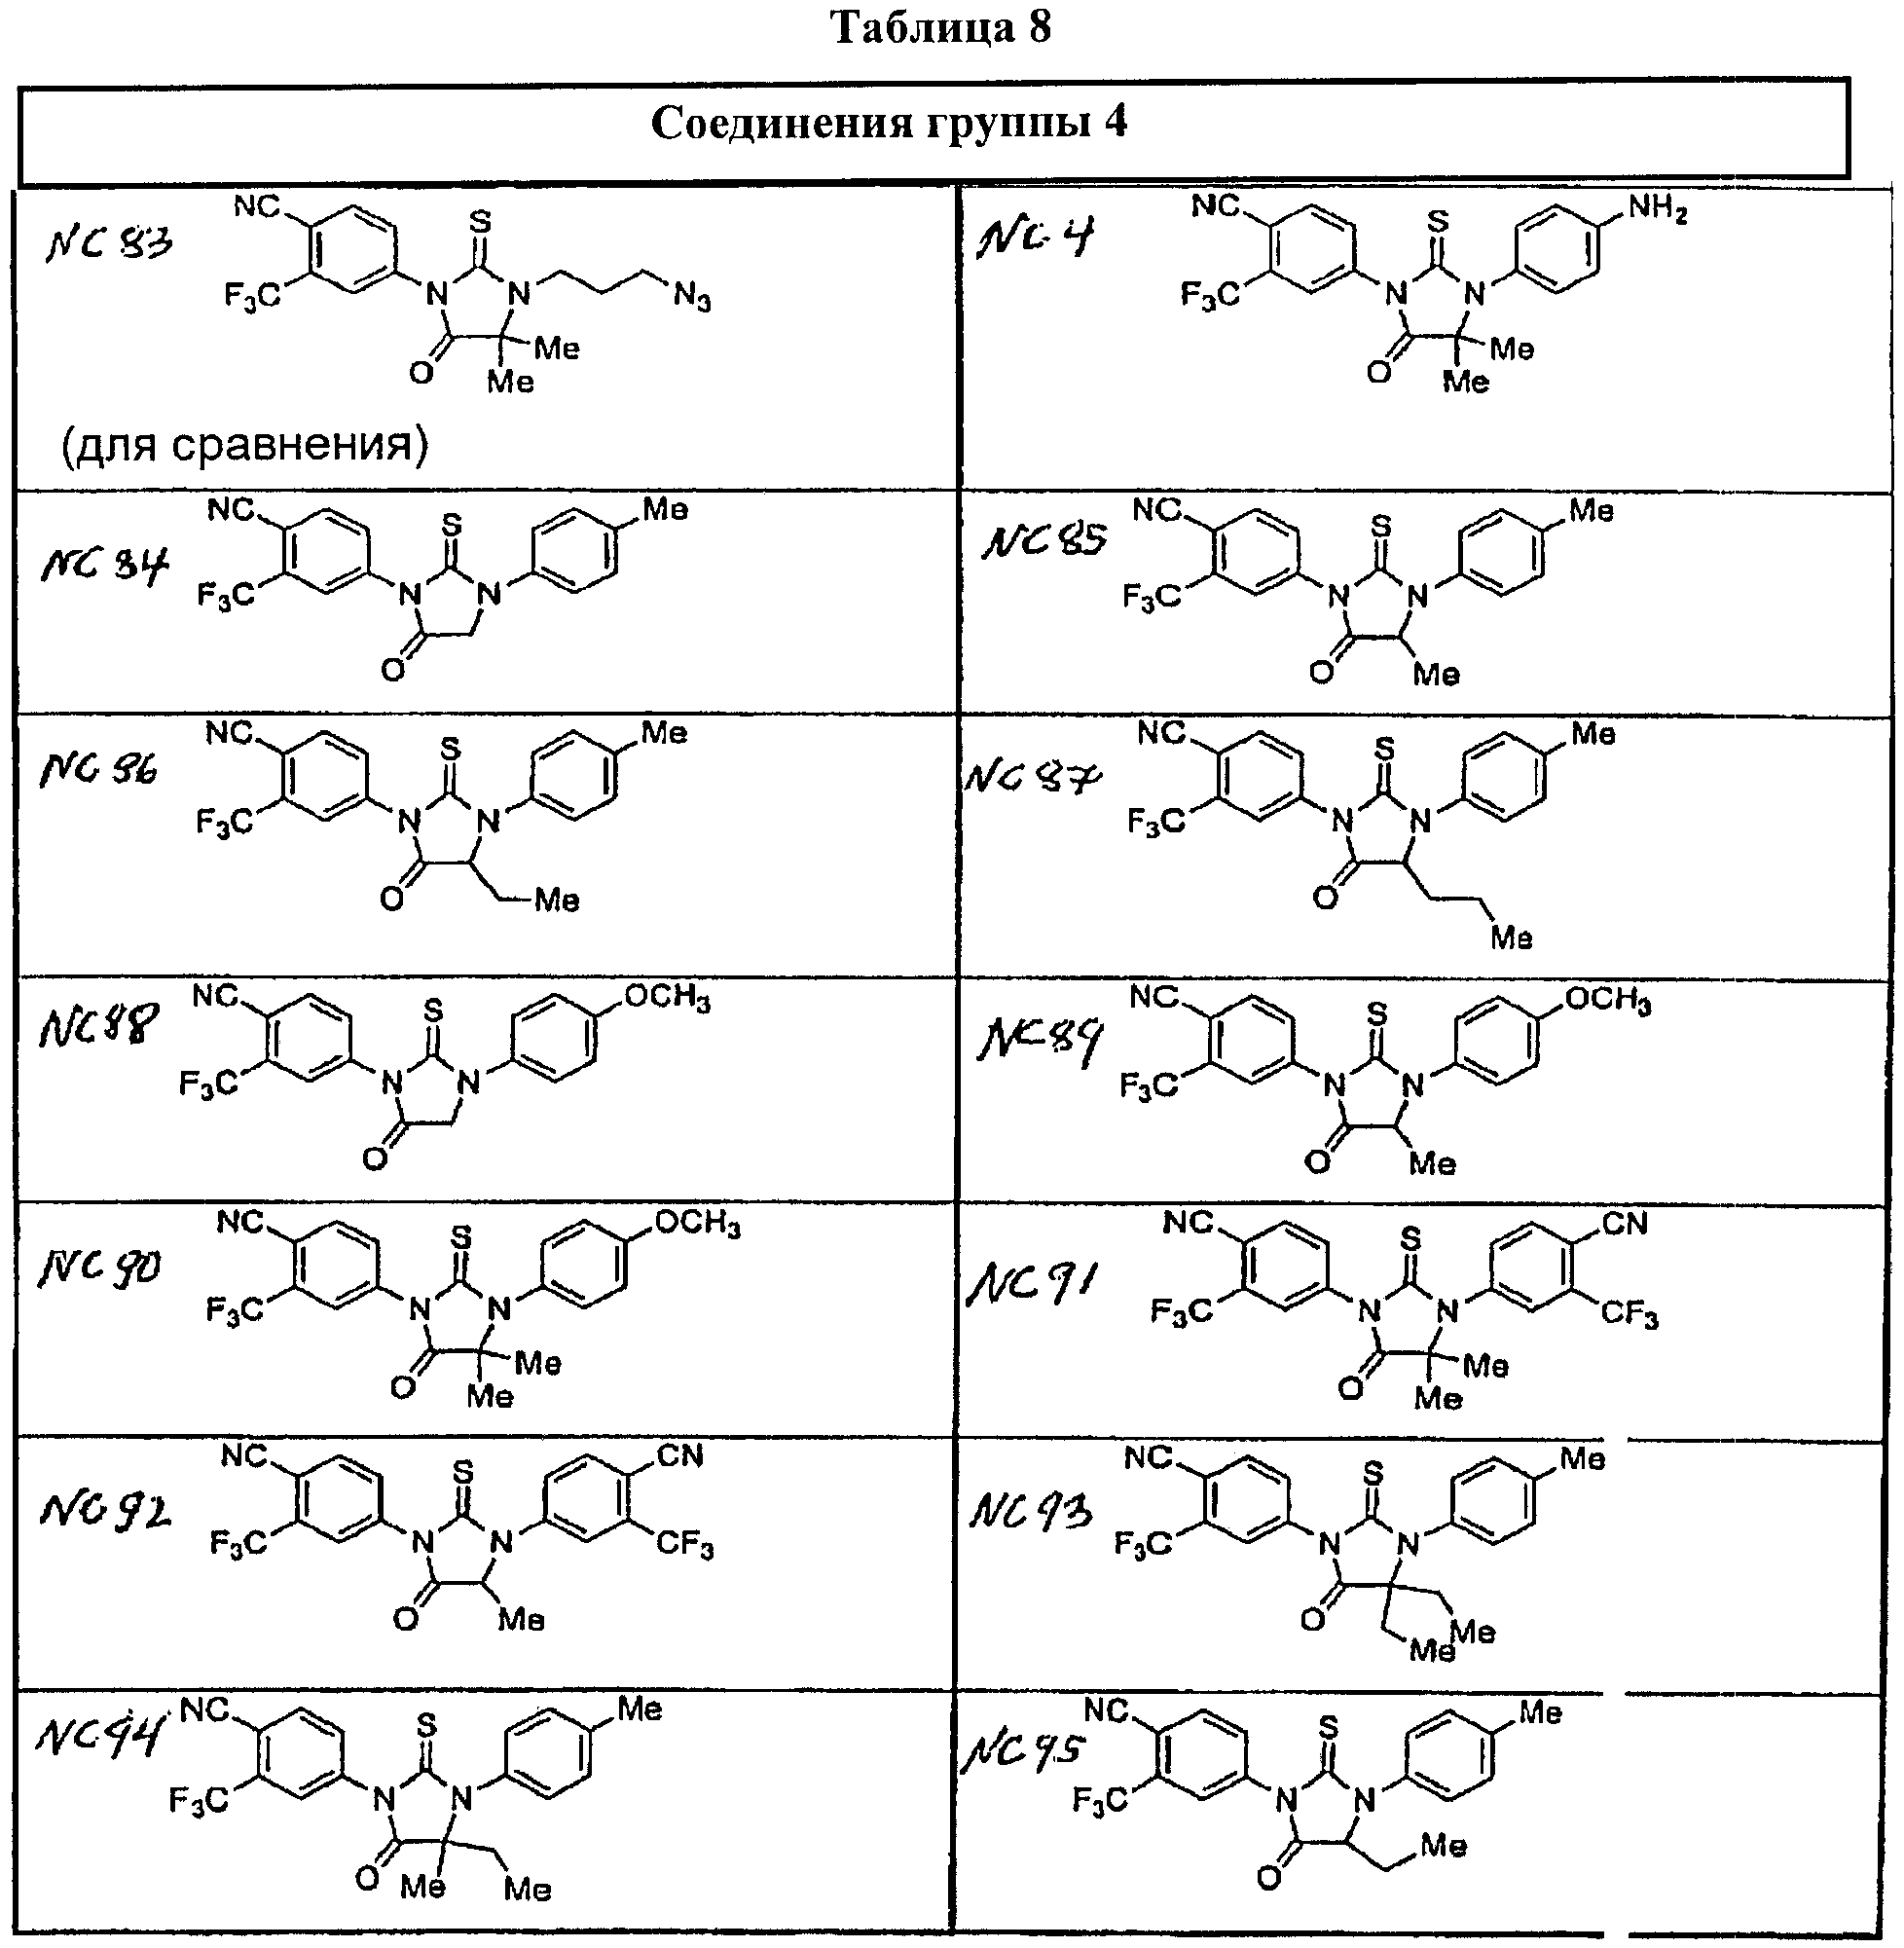 RU2449993C2 - Diarylthiohydatoic compounds - Google Patents